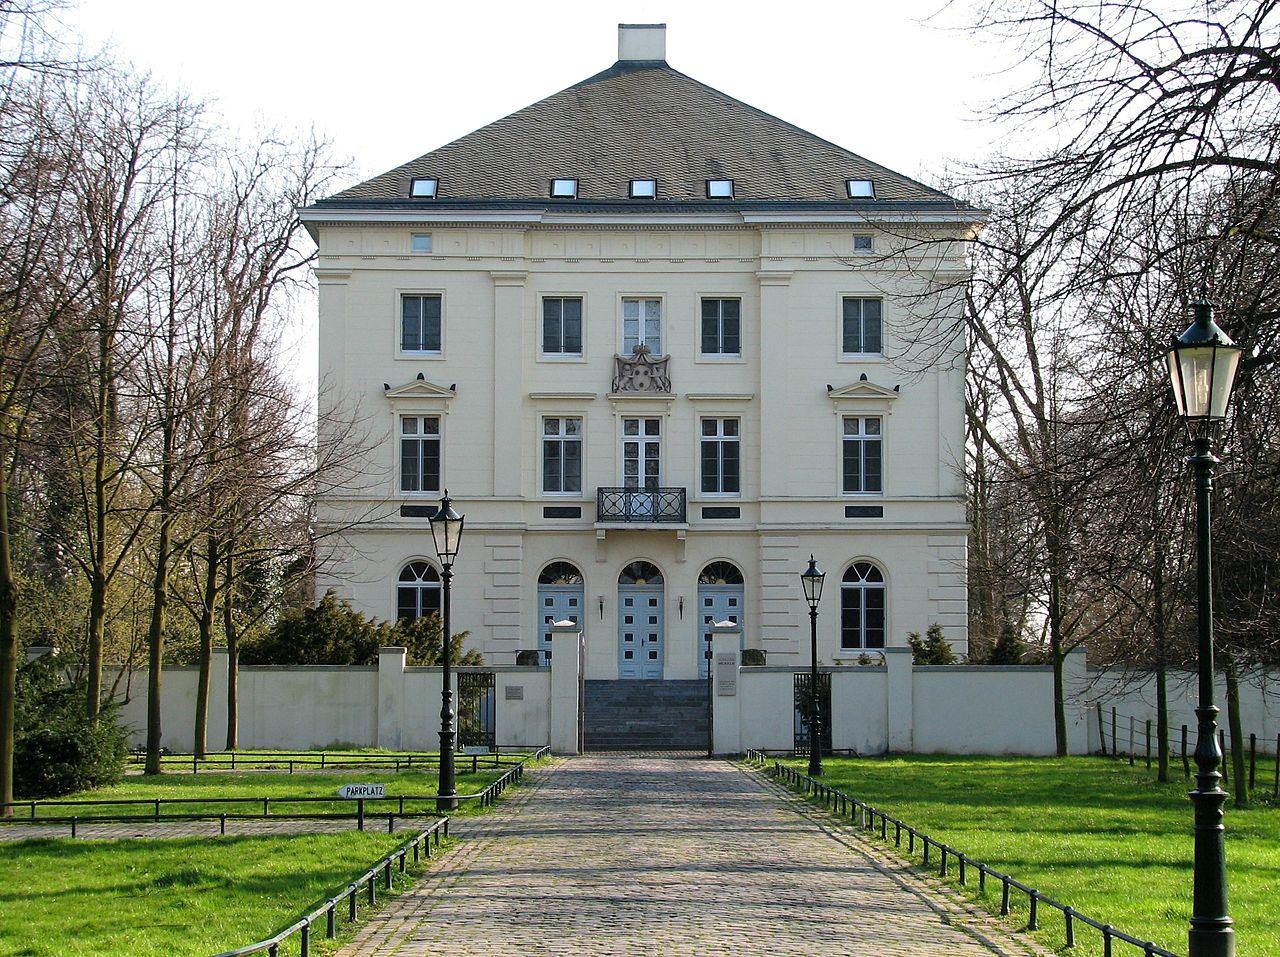 Bild Schloss Mickeln Düssseldorf